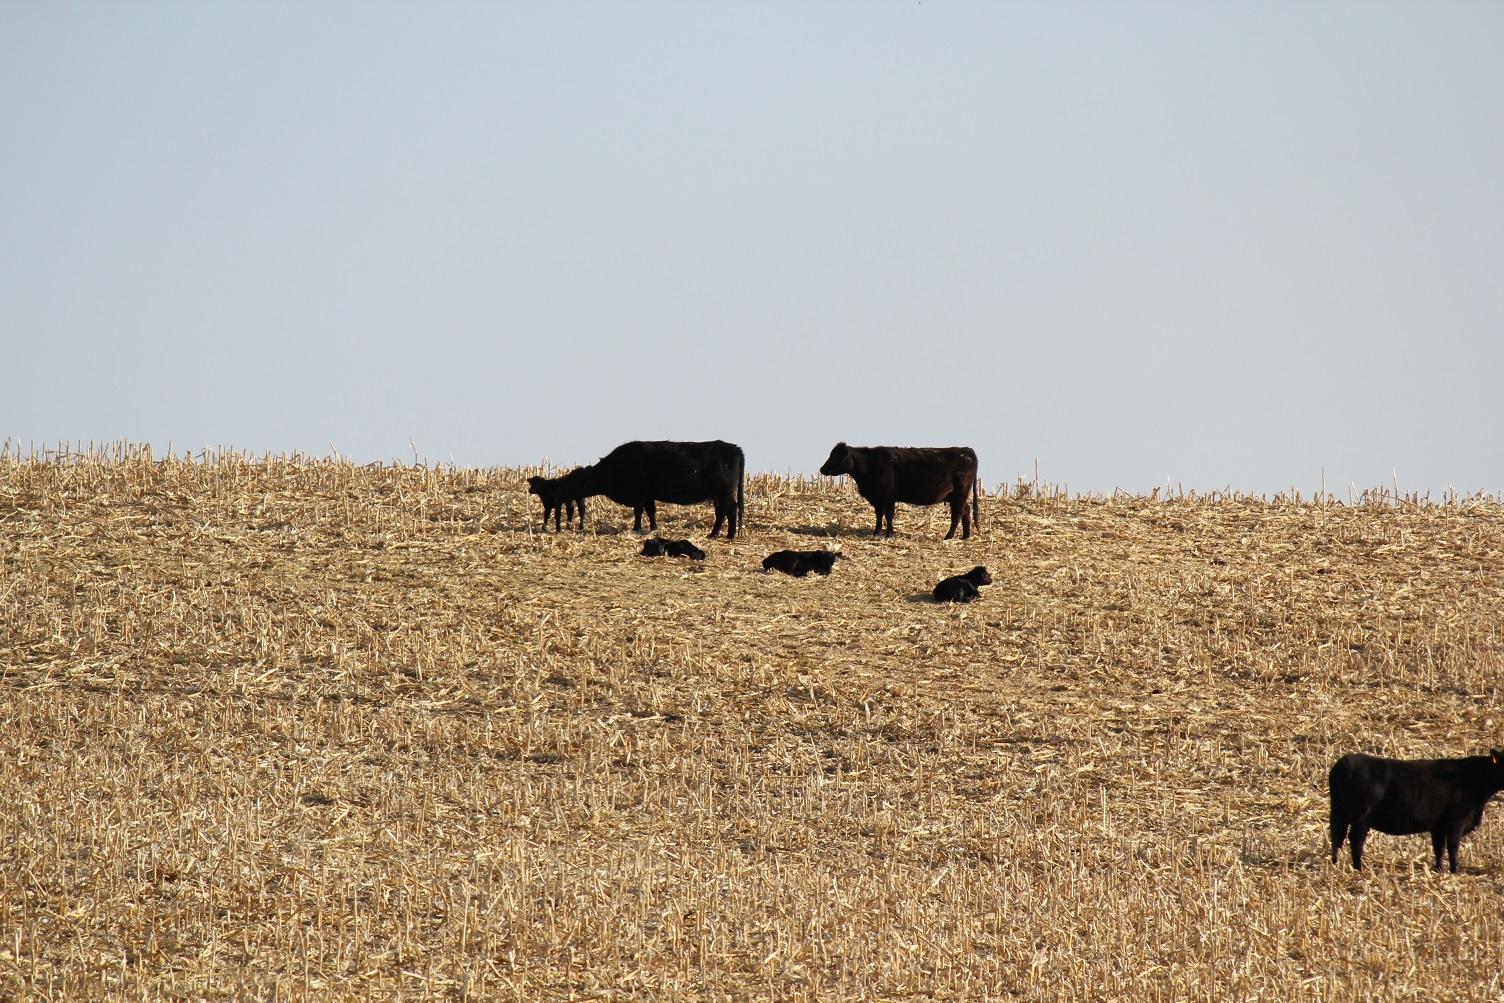 Pairs grazing cornstalks